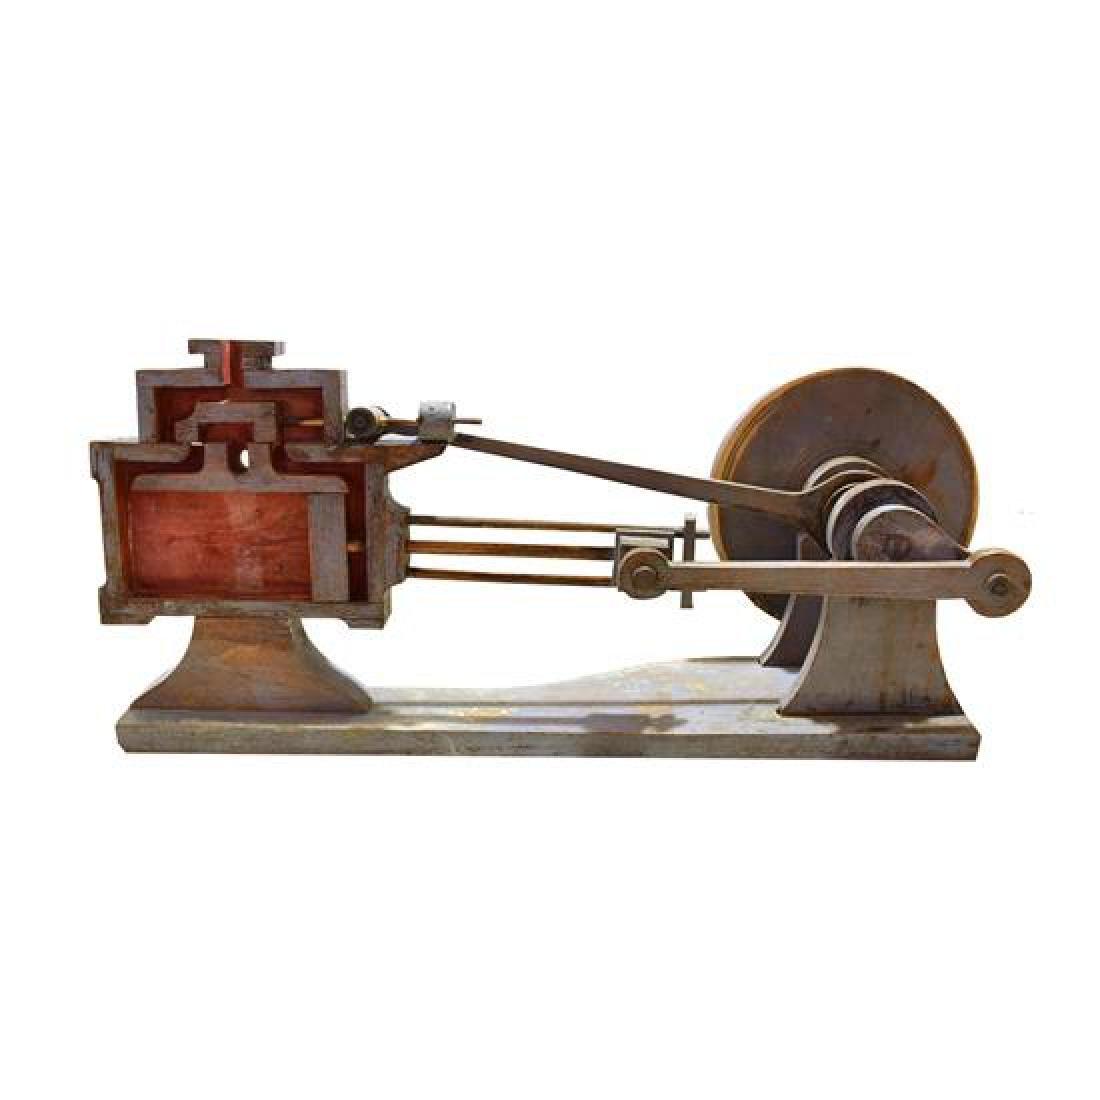 "A Wood Mechanical Teaching Model 28"" W x 14"" D x 12.5"""